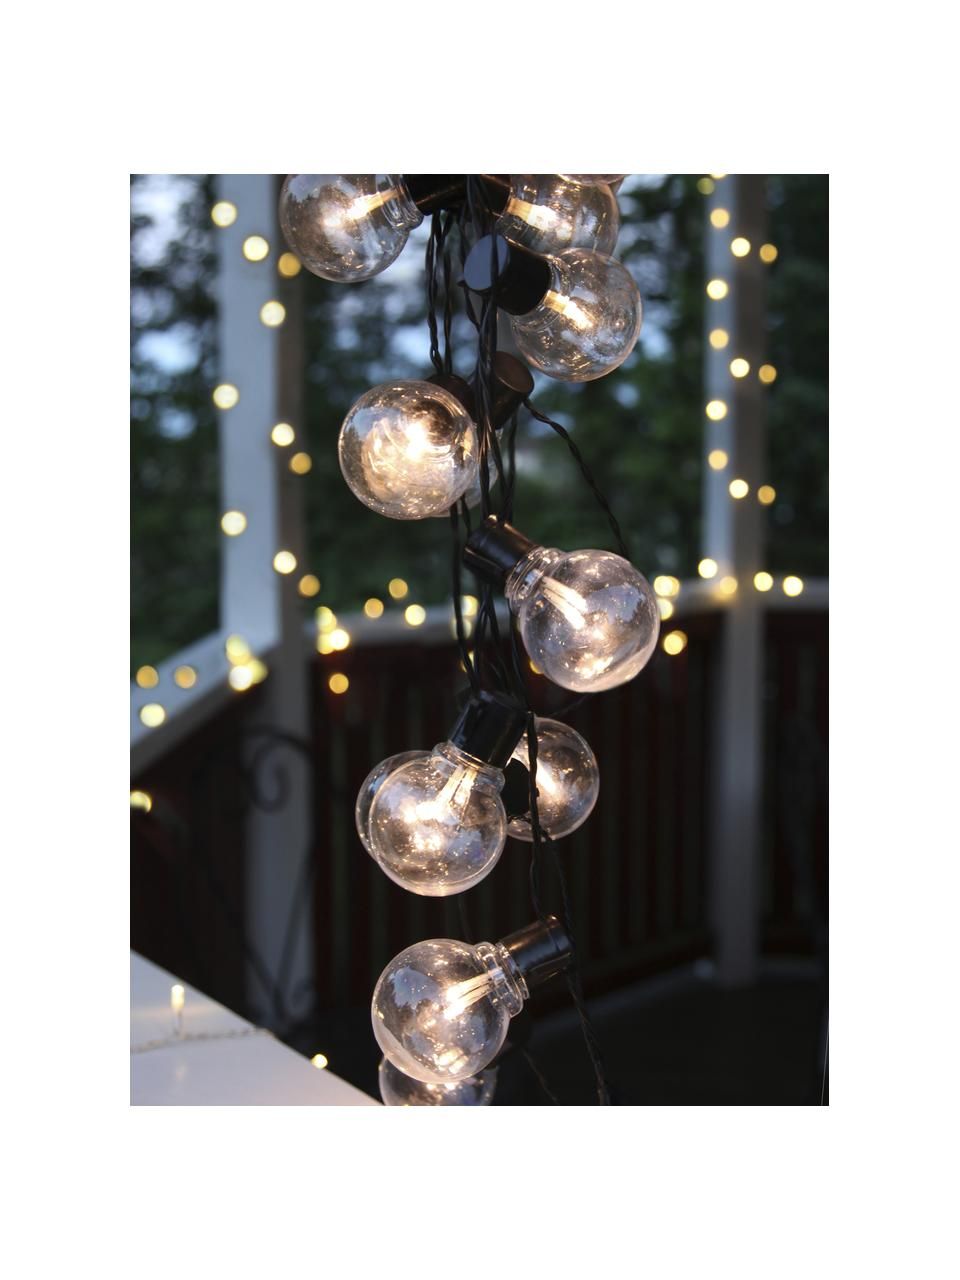 LED lichtslinger Partaj, 950 cm, 16 lampions, Lampions: kunststof, Zwart, L 500 cm